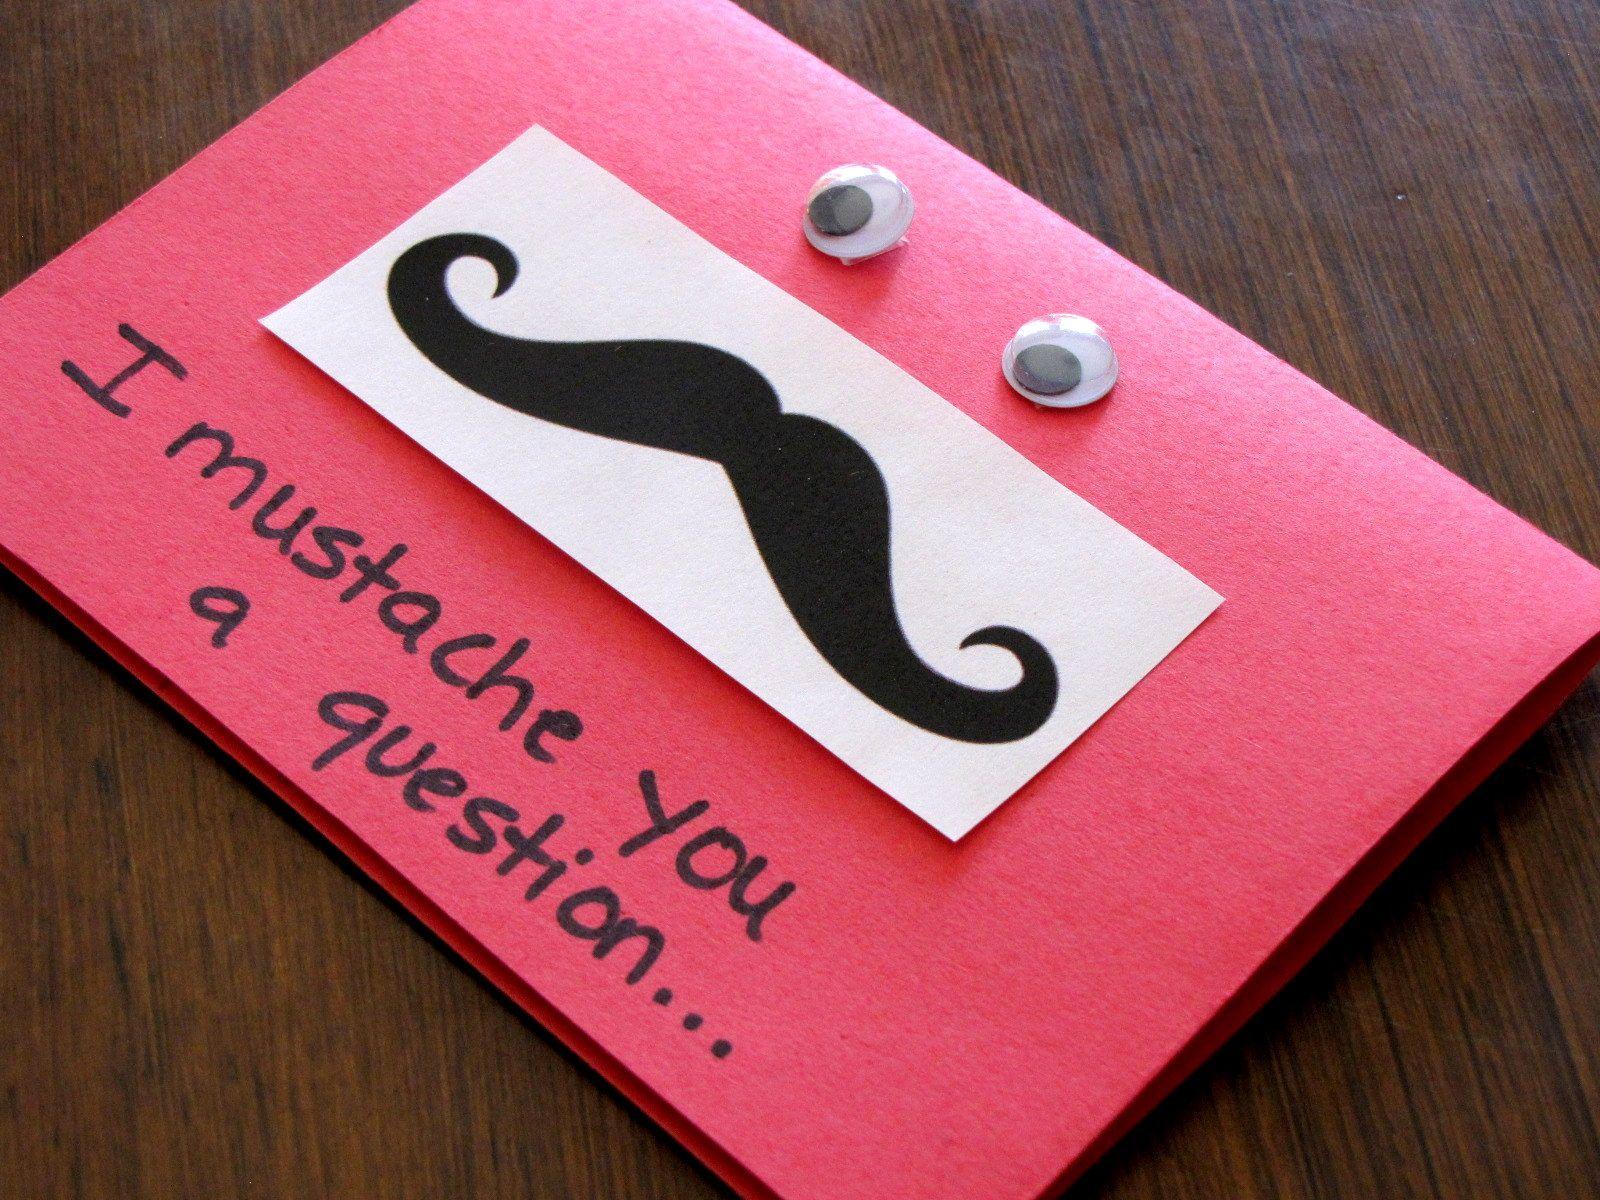 homemade valentines cards for kids google search - Homemade Valentine Cards For Kids